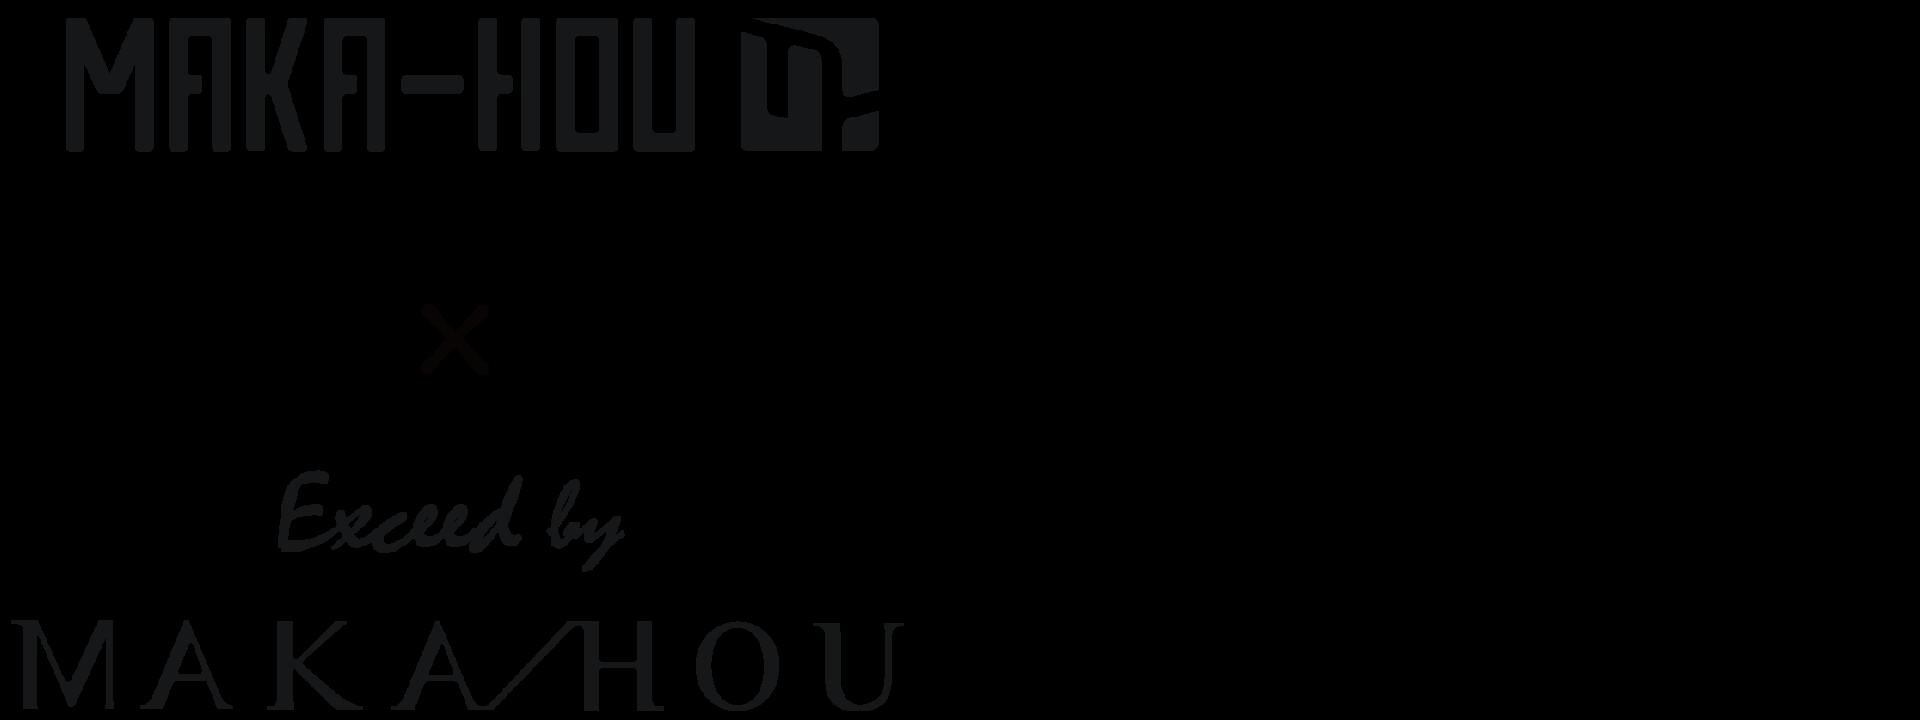 MAKA-HOU公式オンラインストア